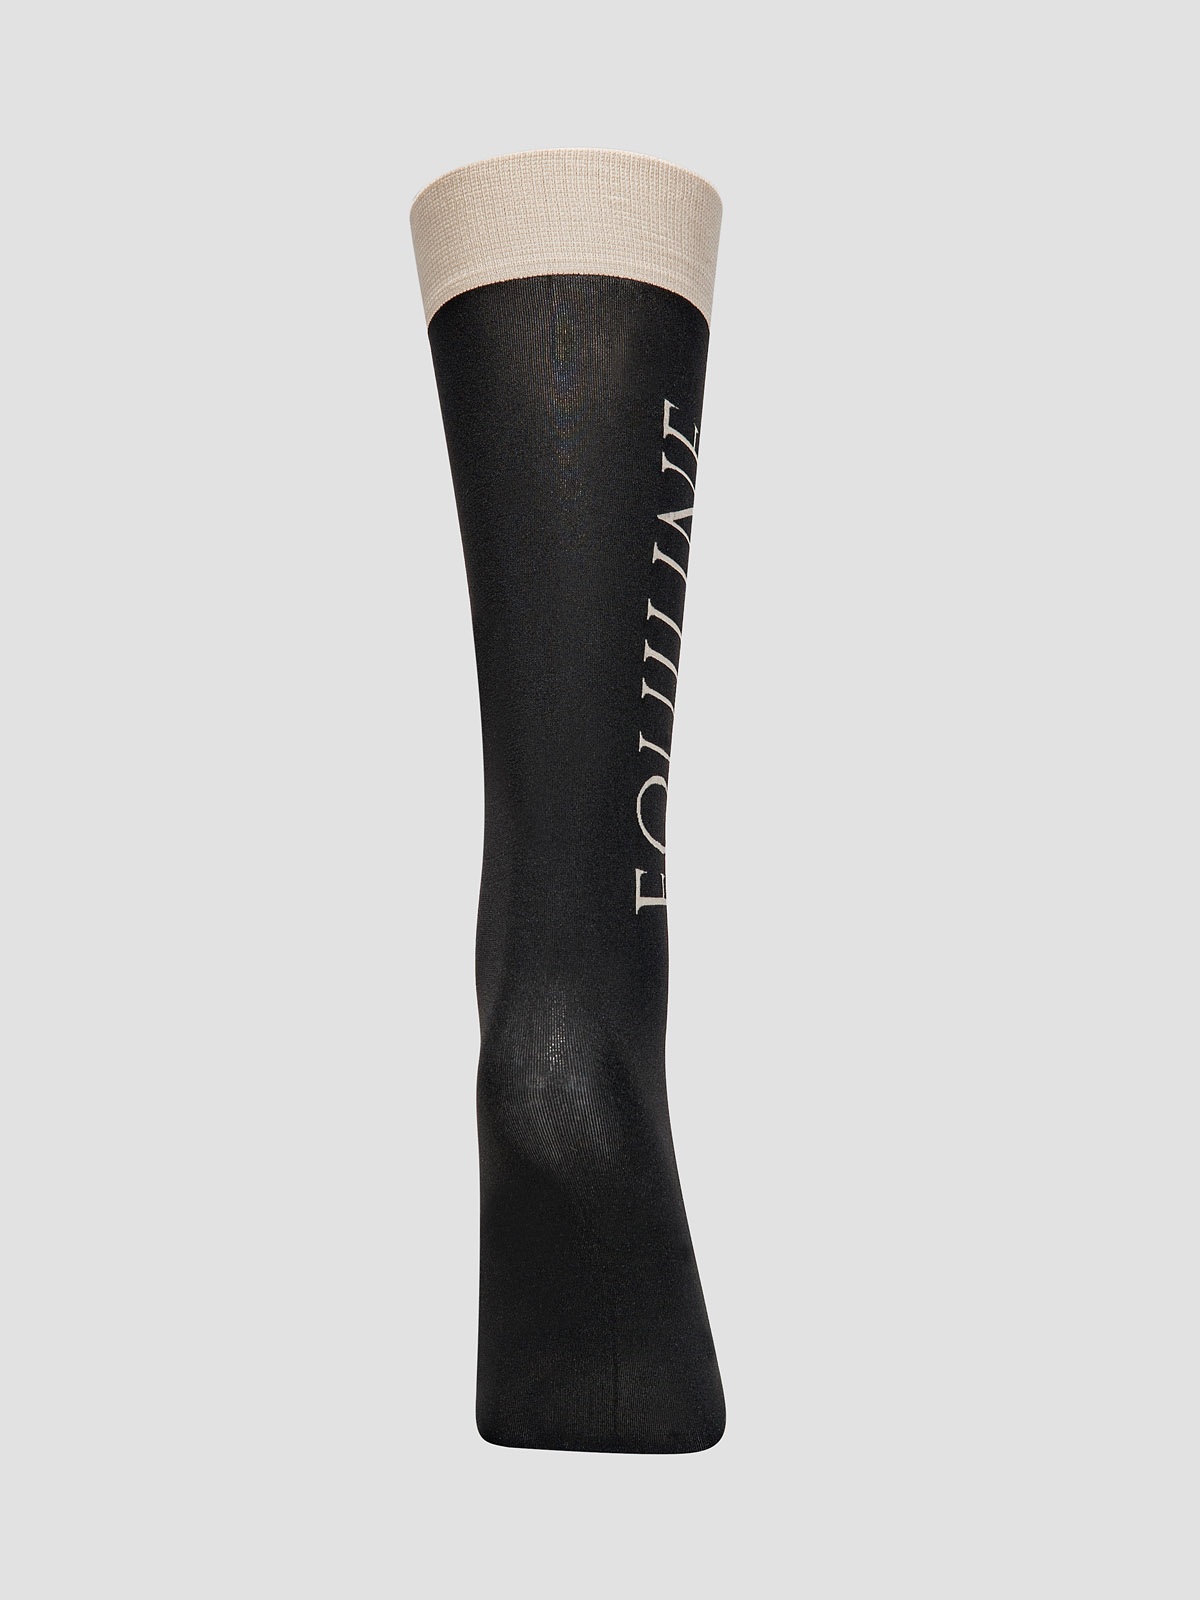 SOFTLY - Ultra-thin Microfibre Socks 2